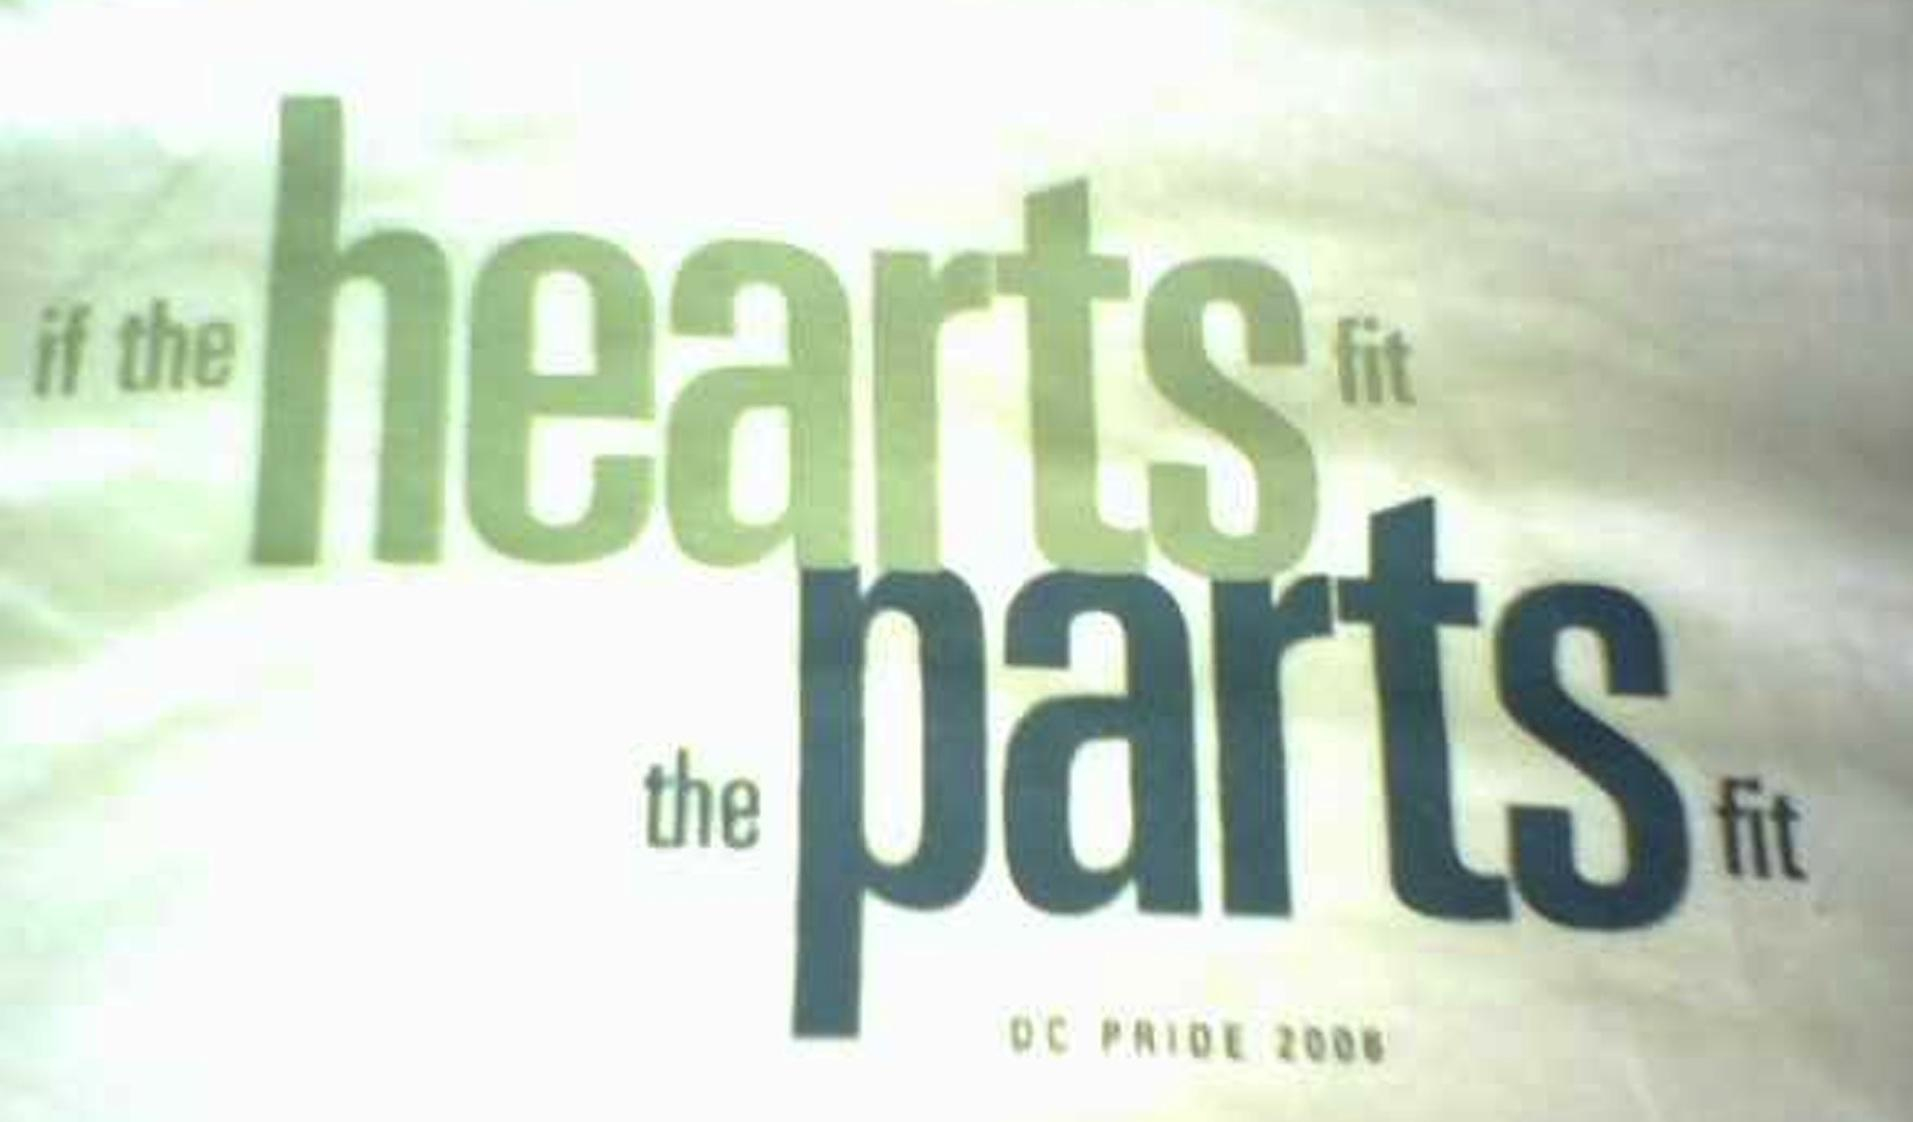 Heart fits  pants fit